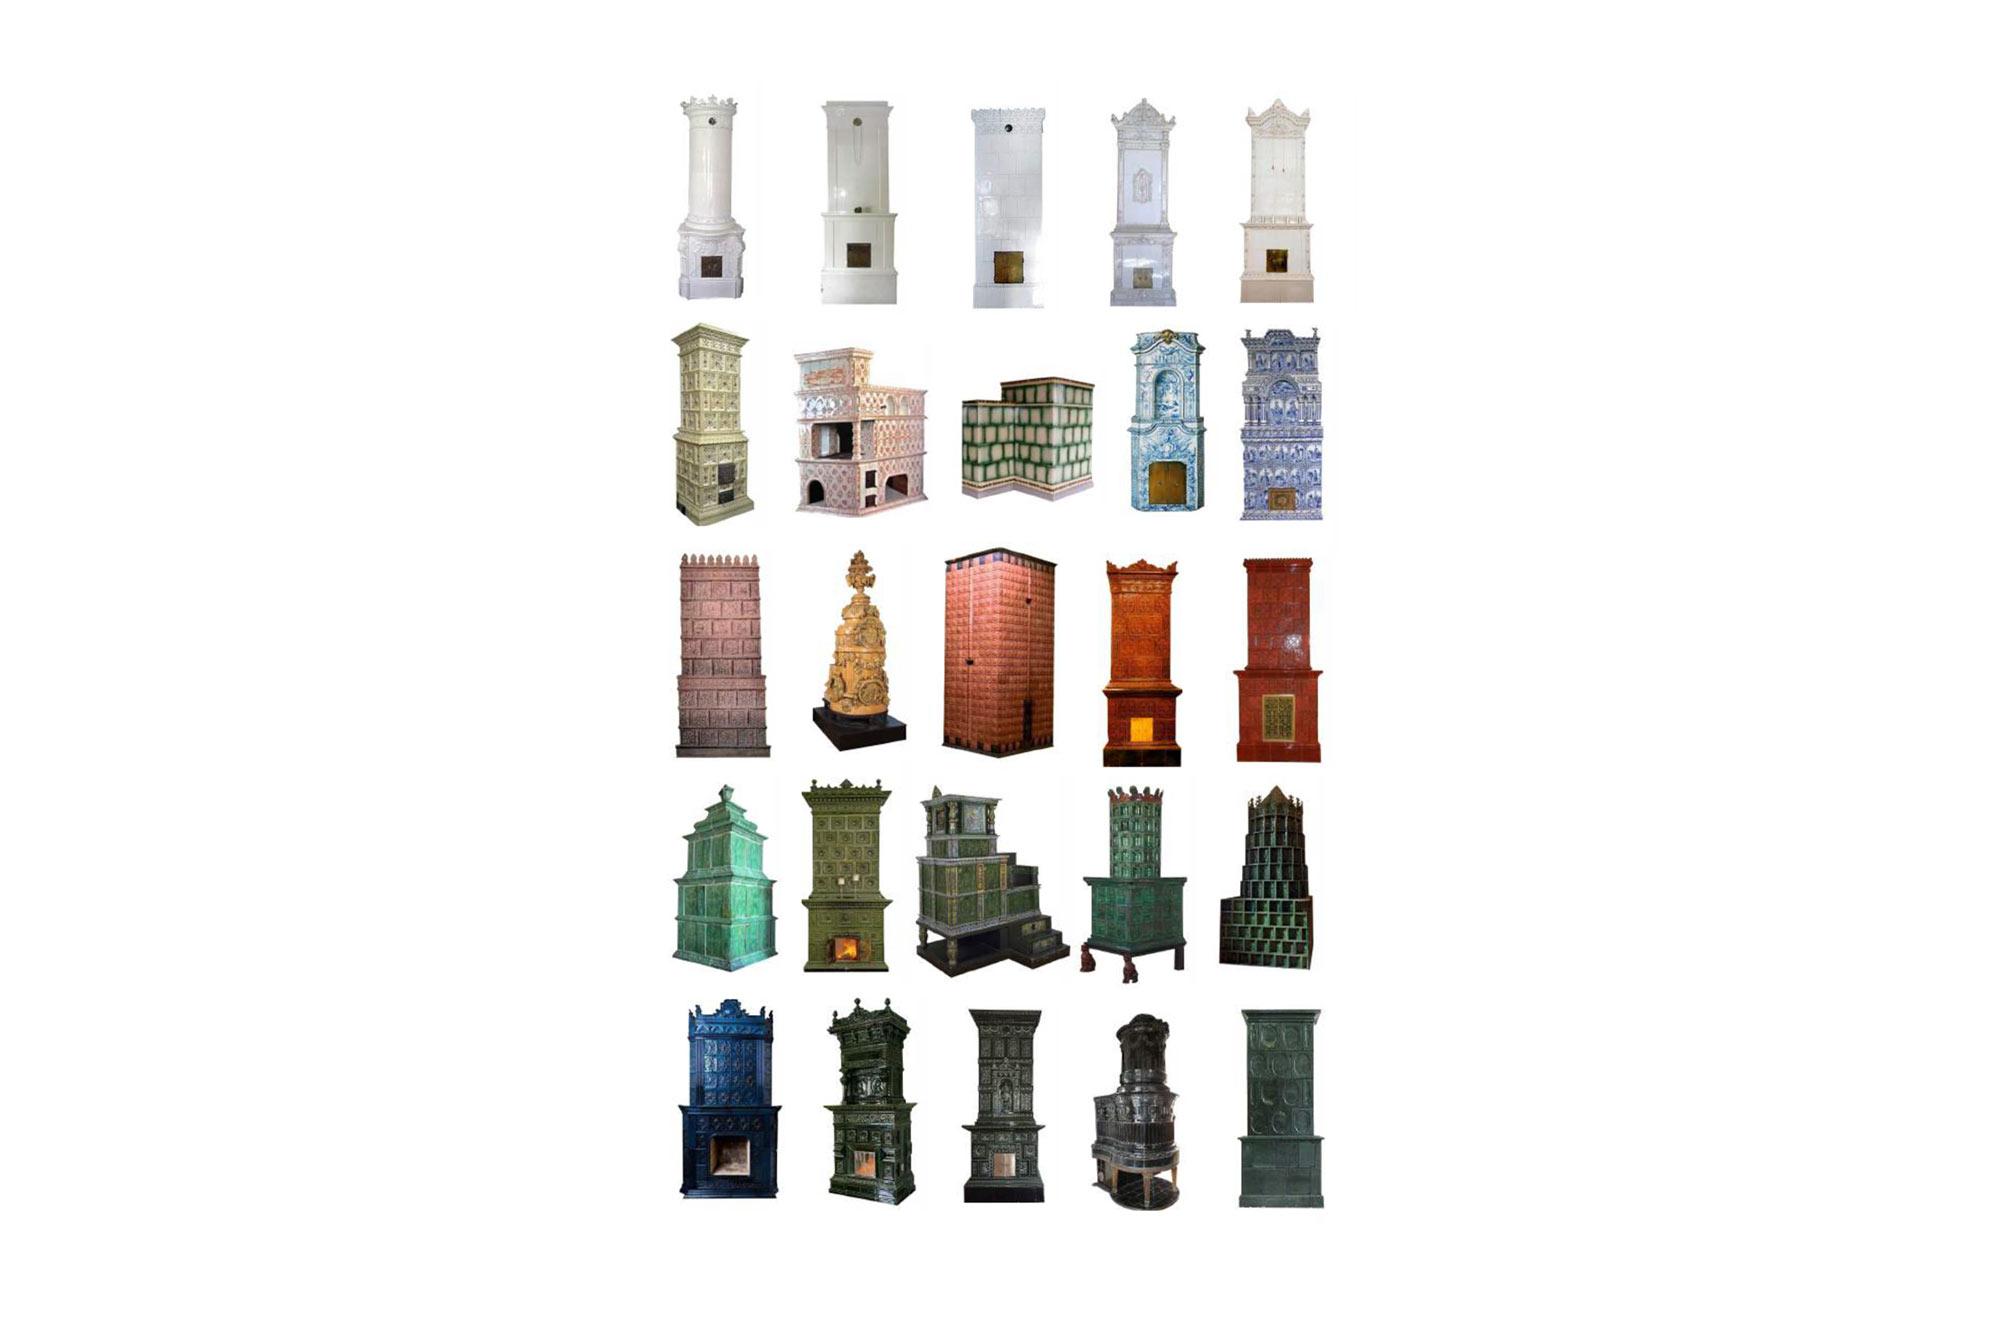 cube-haus-skene-catling-architects-cs-2000×1332-13